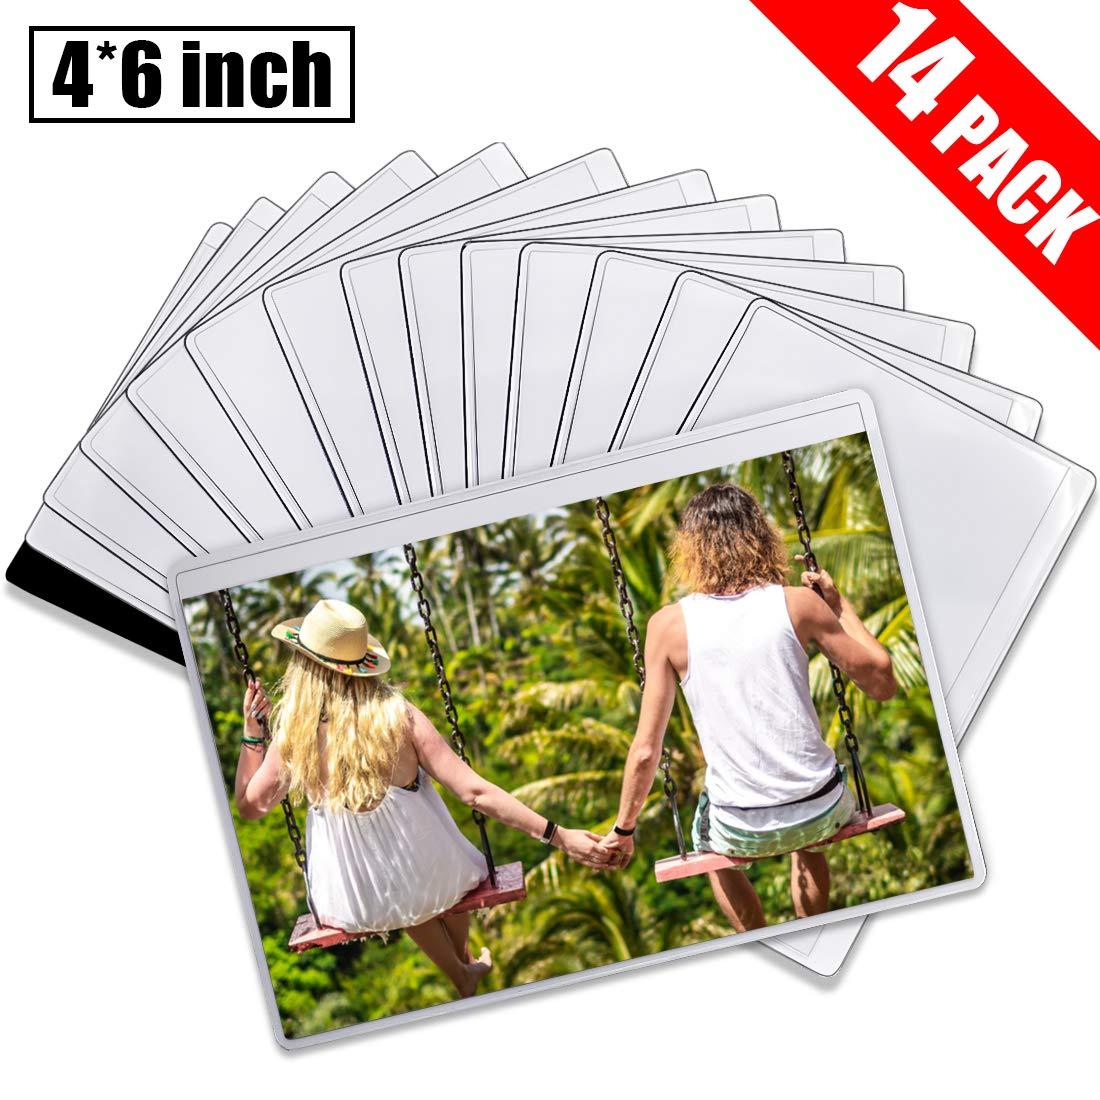 DIYSELF 14 Pack Magnetic Picture Frames for Refrigerator 4x6 Picture Frame, Refrigerator Magnets, Fridge Magnets, Magnetic Photo Pocket